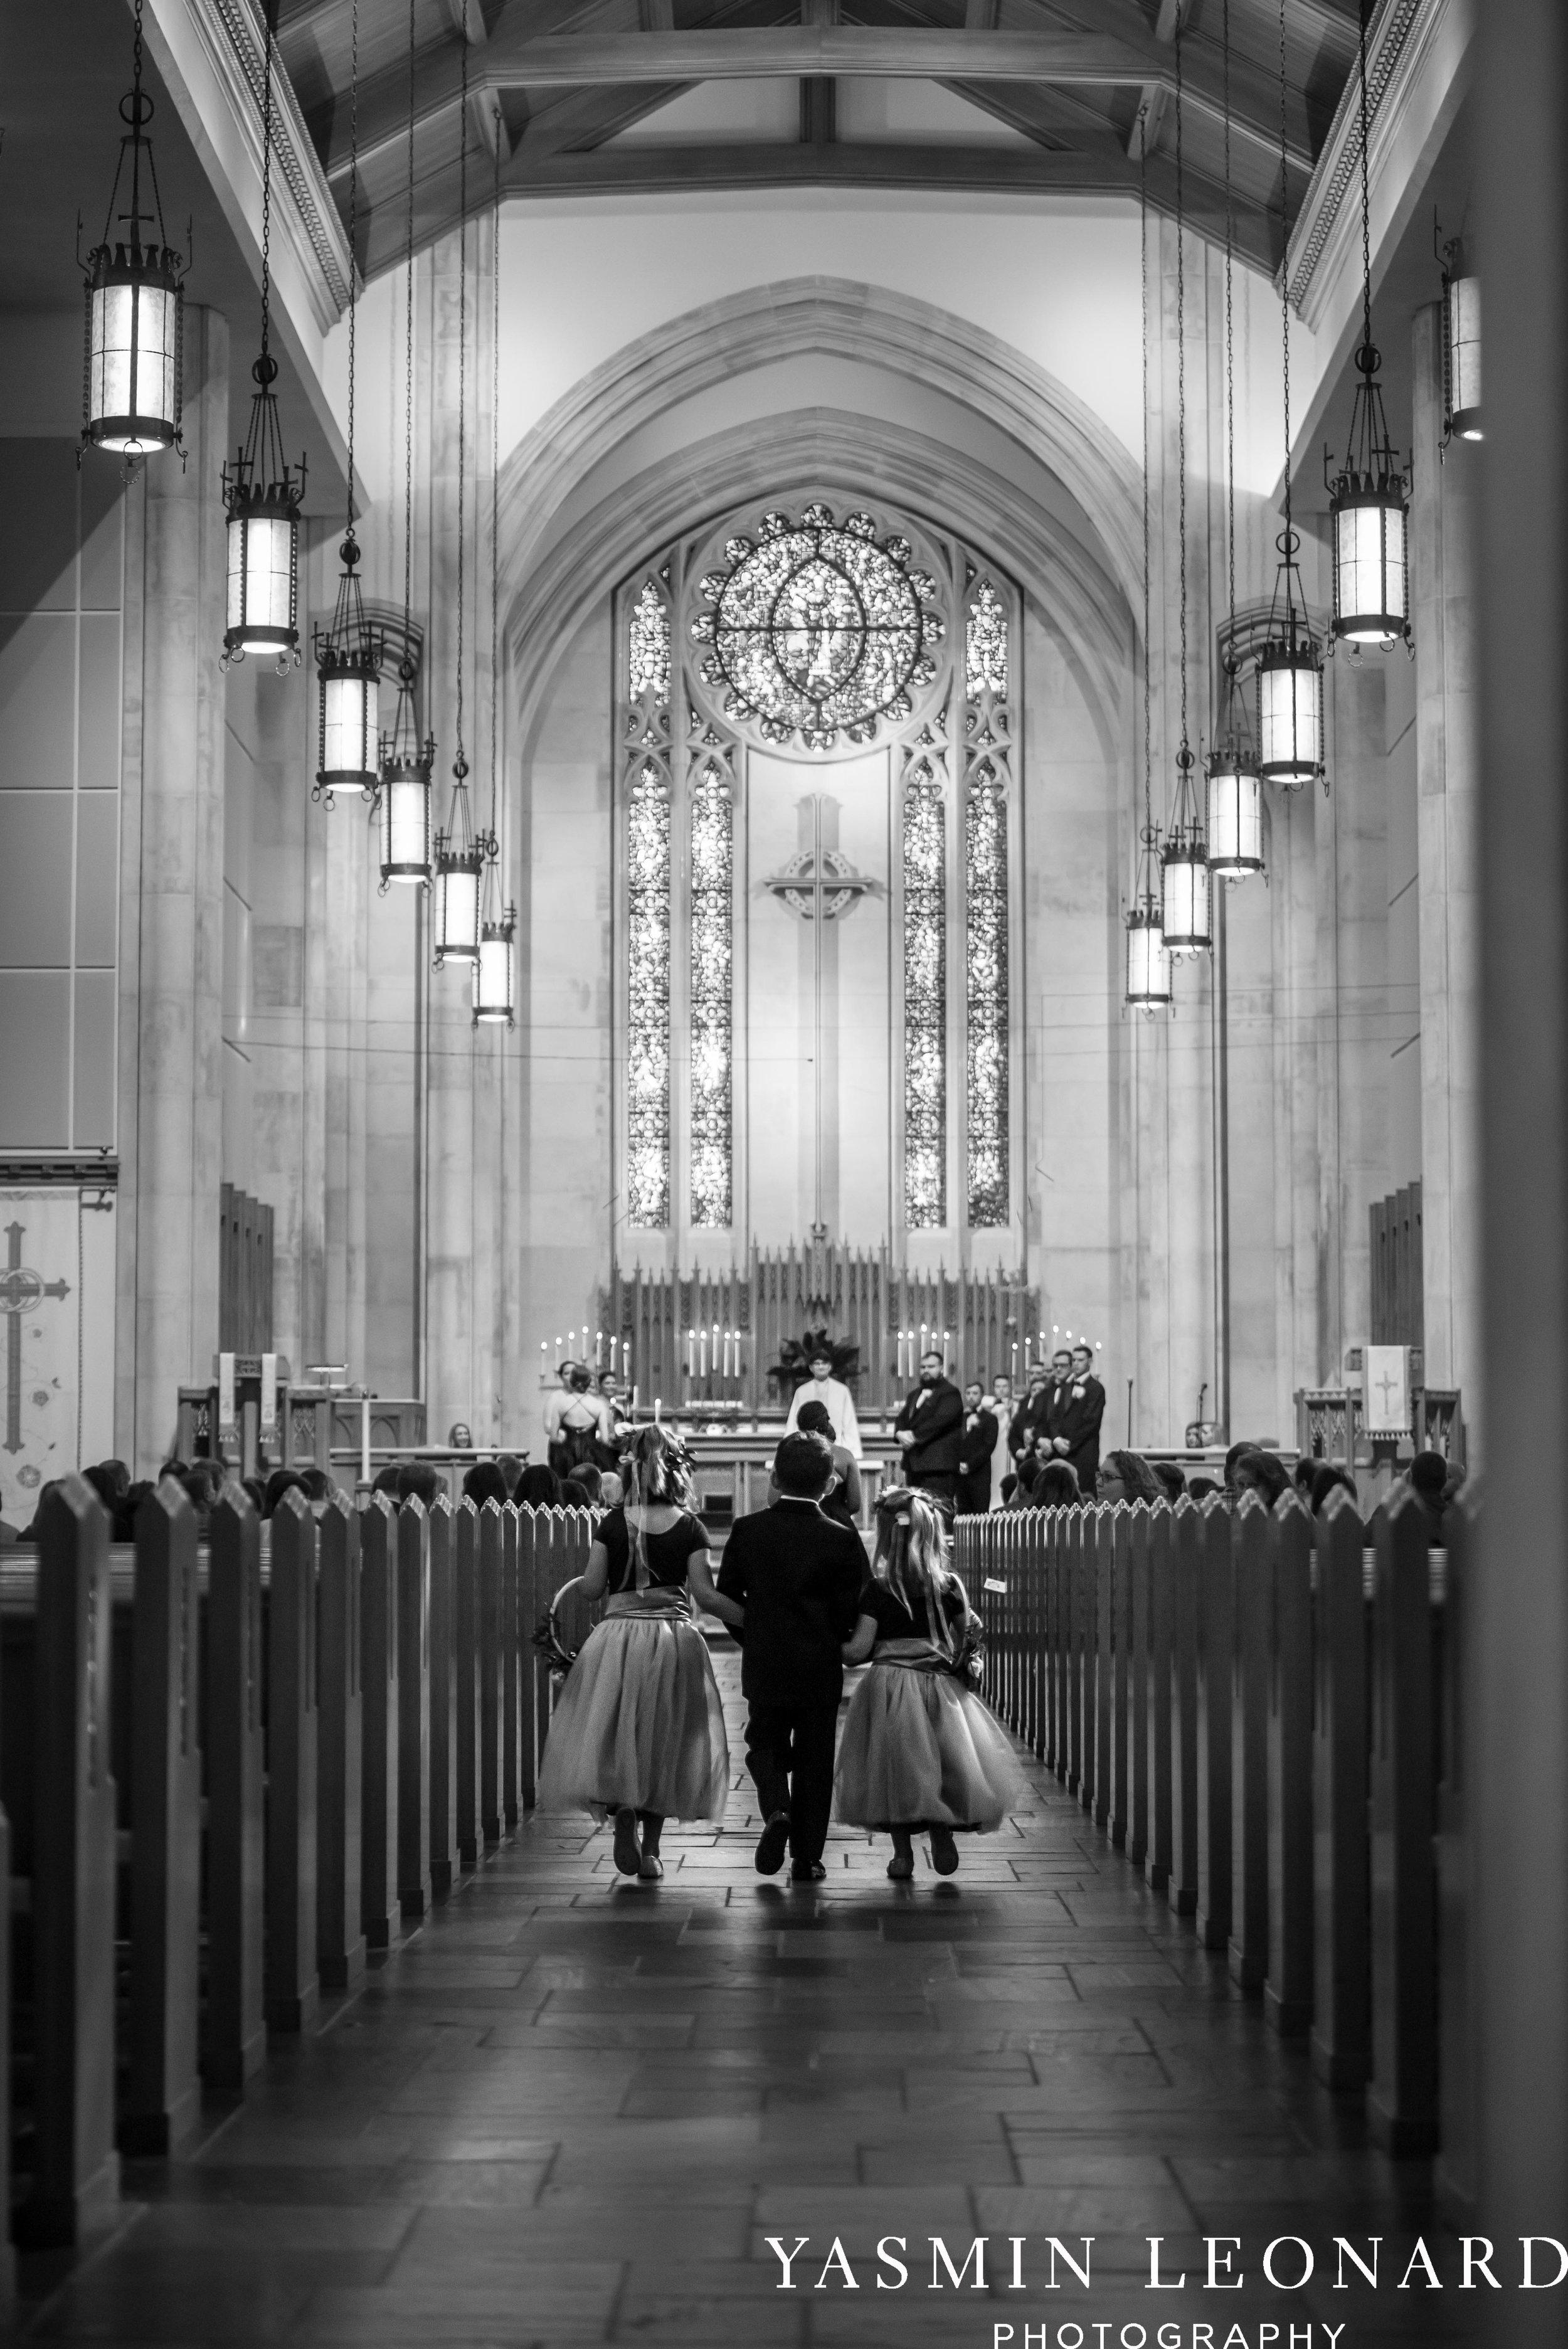 Wesley Memorial United Methodist Church - Old Homeplace Winery - High Point Weddings - High Point Wedding Photographer - NC Weddings - NC Barn Venue - Yasmin Leonard Photography-12.jpg